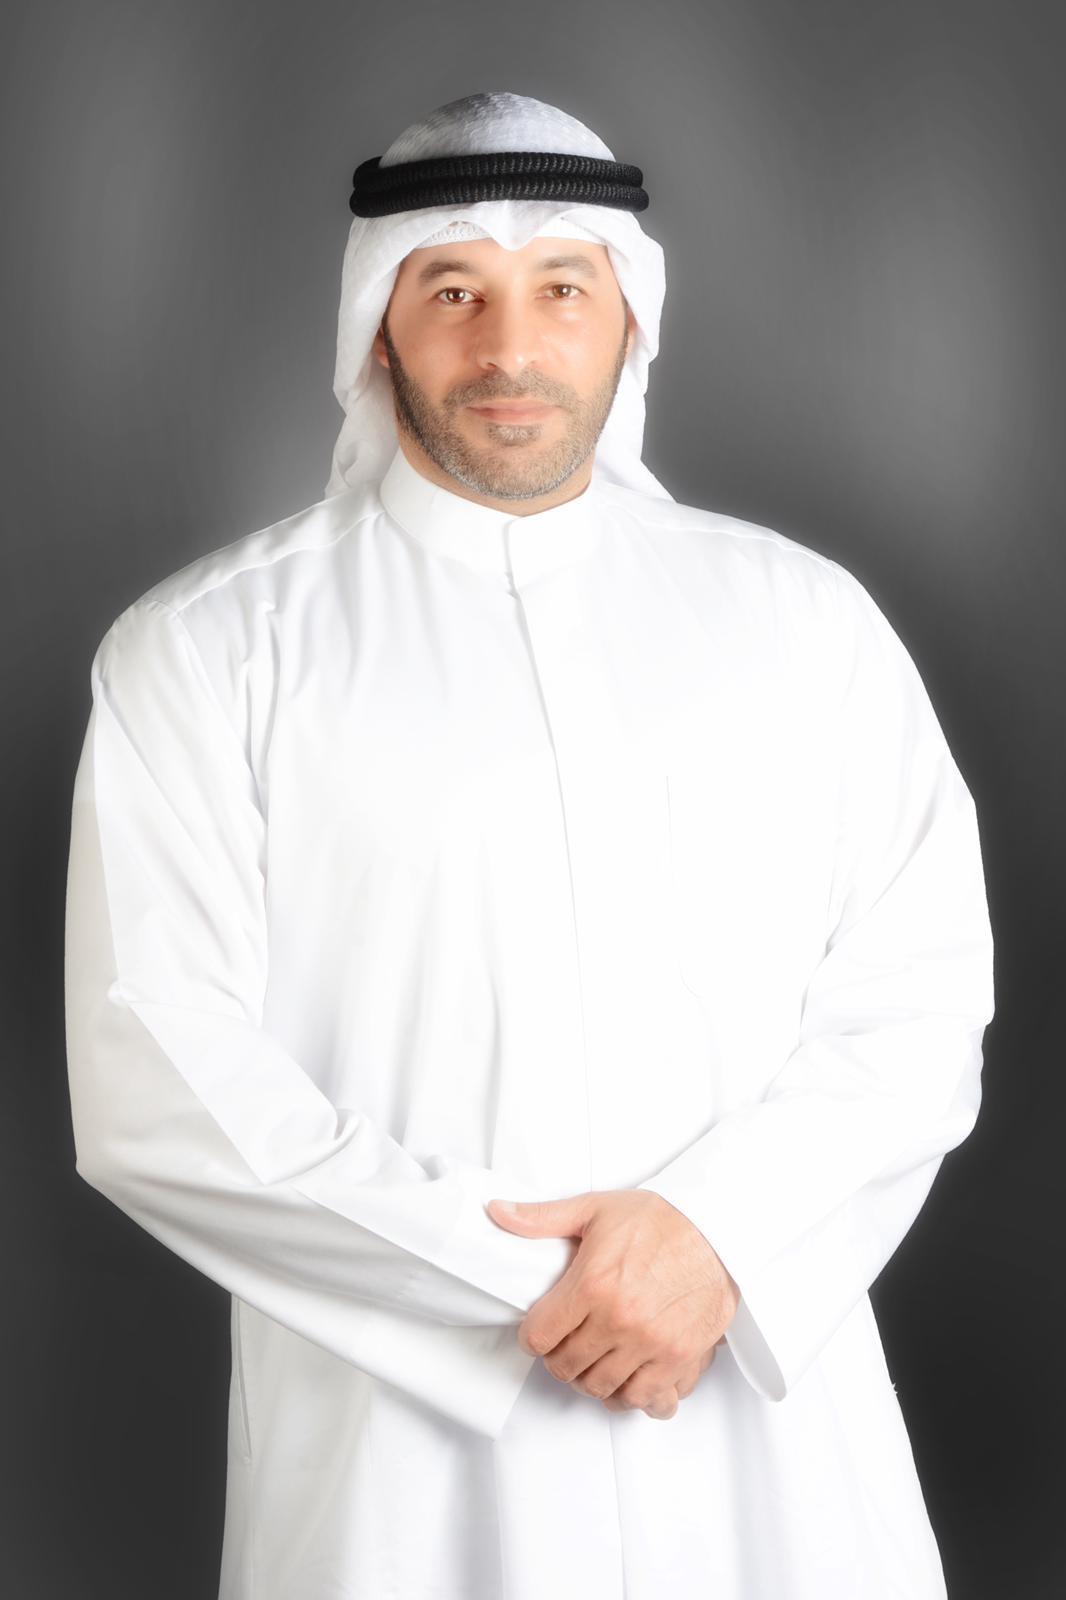 Abdulaziz Alateeqi